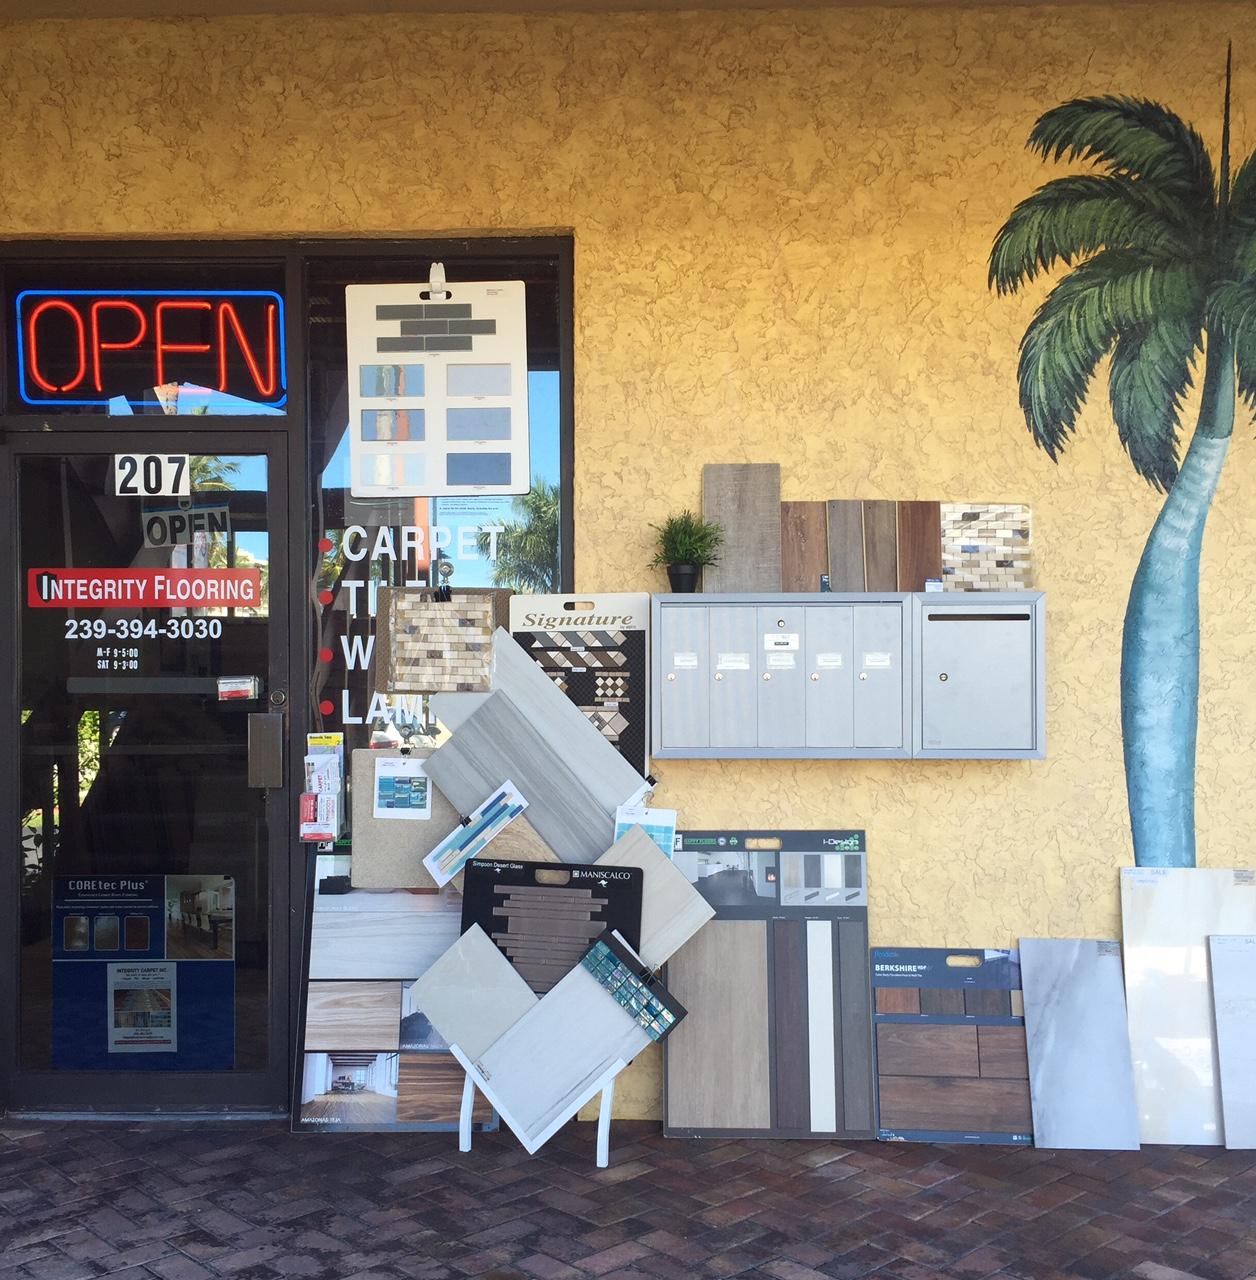 Integrity Flooring 207 North Collier Boulevard Marco Island, FL  Tile Ceramic Contractors U0026 Dealers   MapQuest